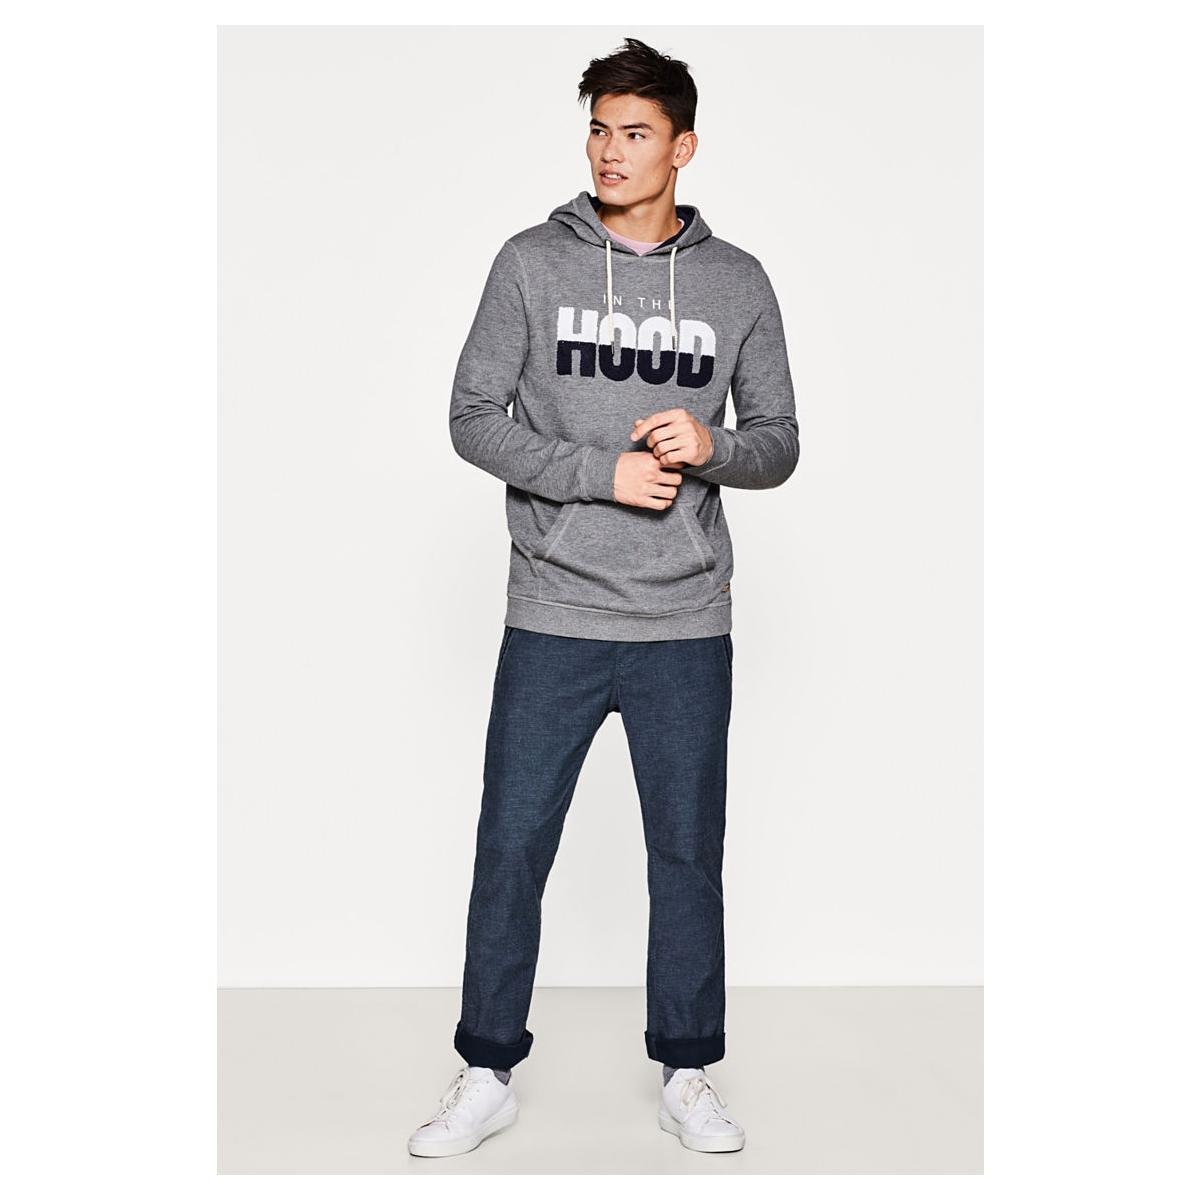 127cc2j004 edc sweater c035